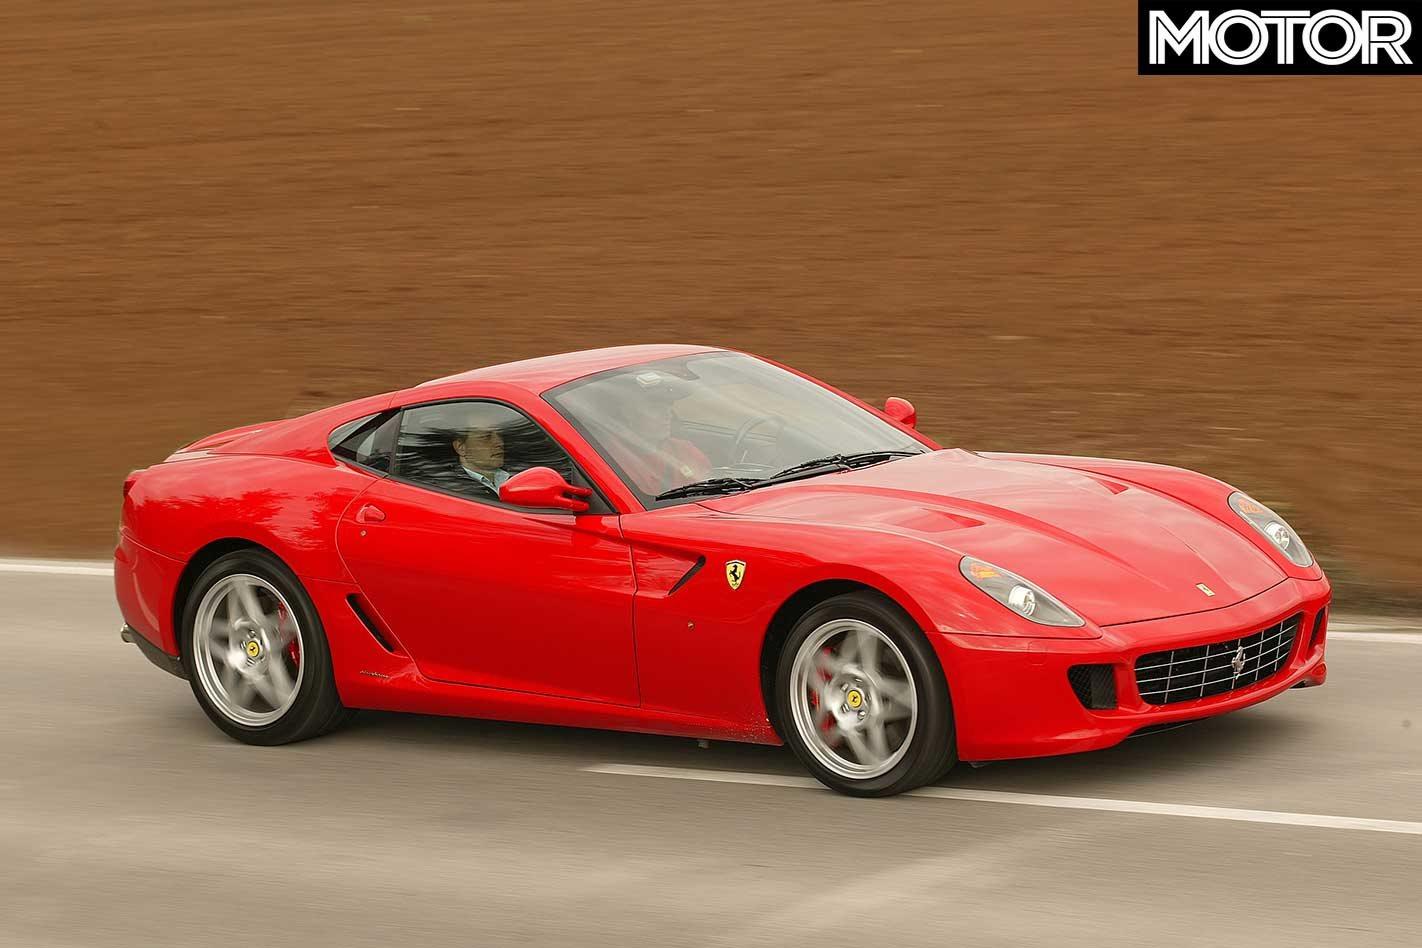 2006 Ferrari 599 GTB Fiorano review: classic MOTOR